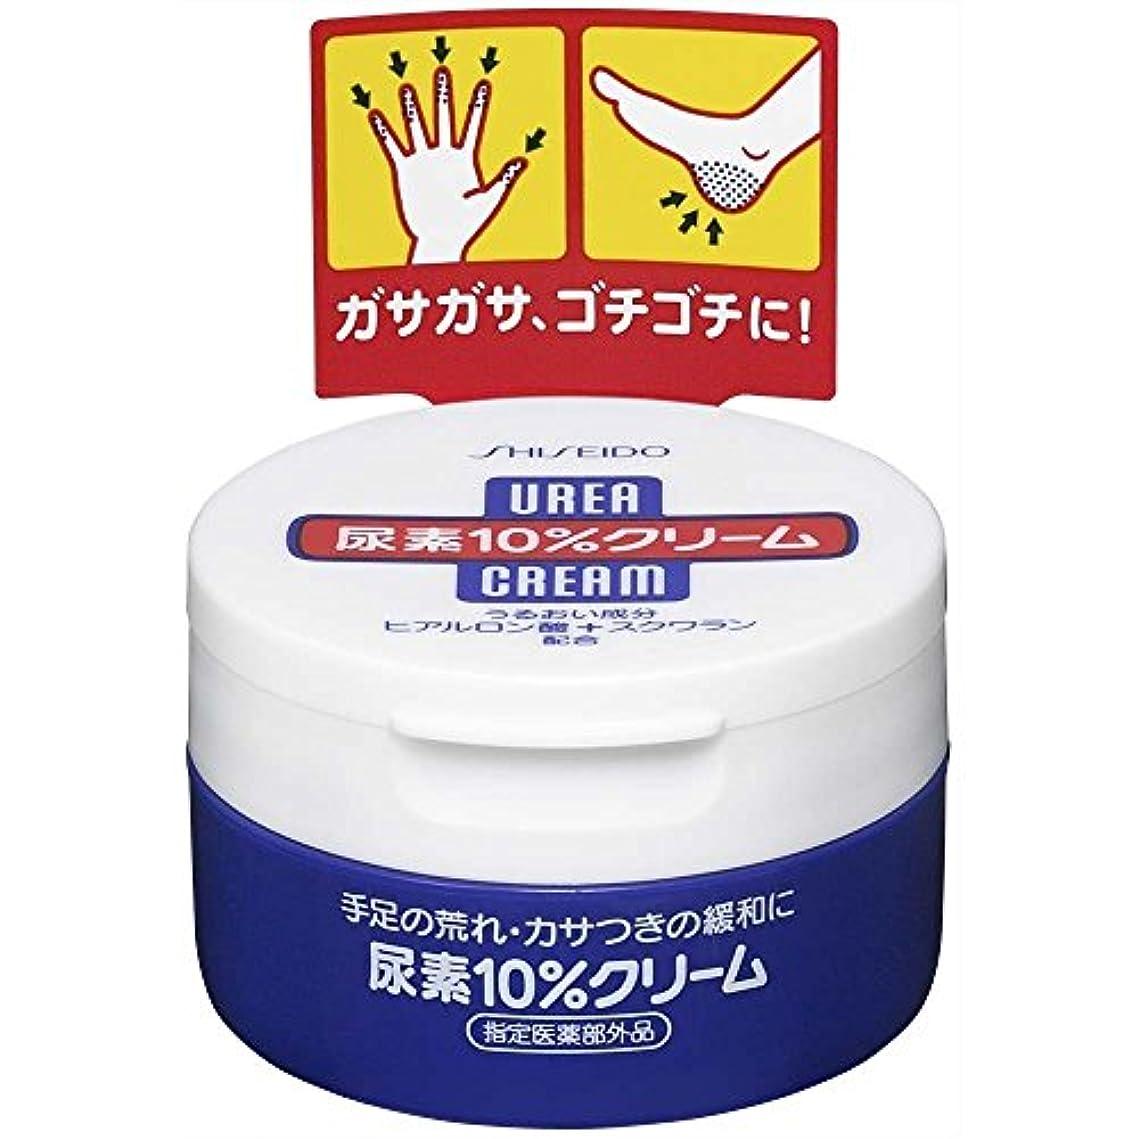 白鳥寺院剣資生堂 尿素10%クリーム 100g(医薬部外品)